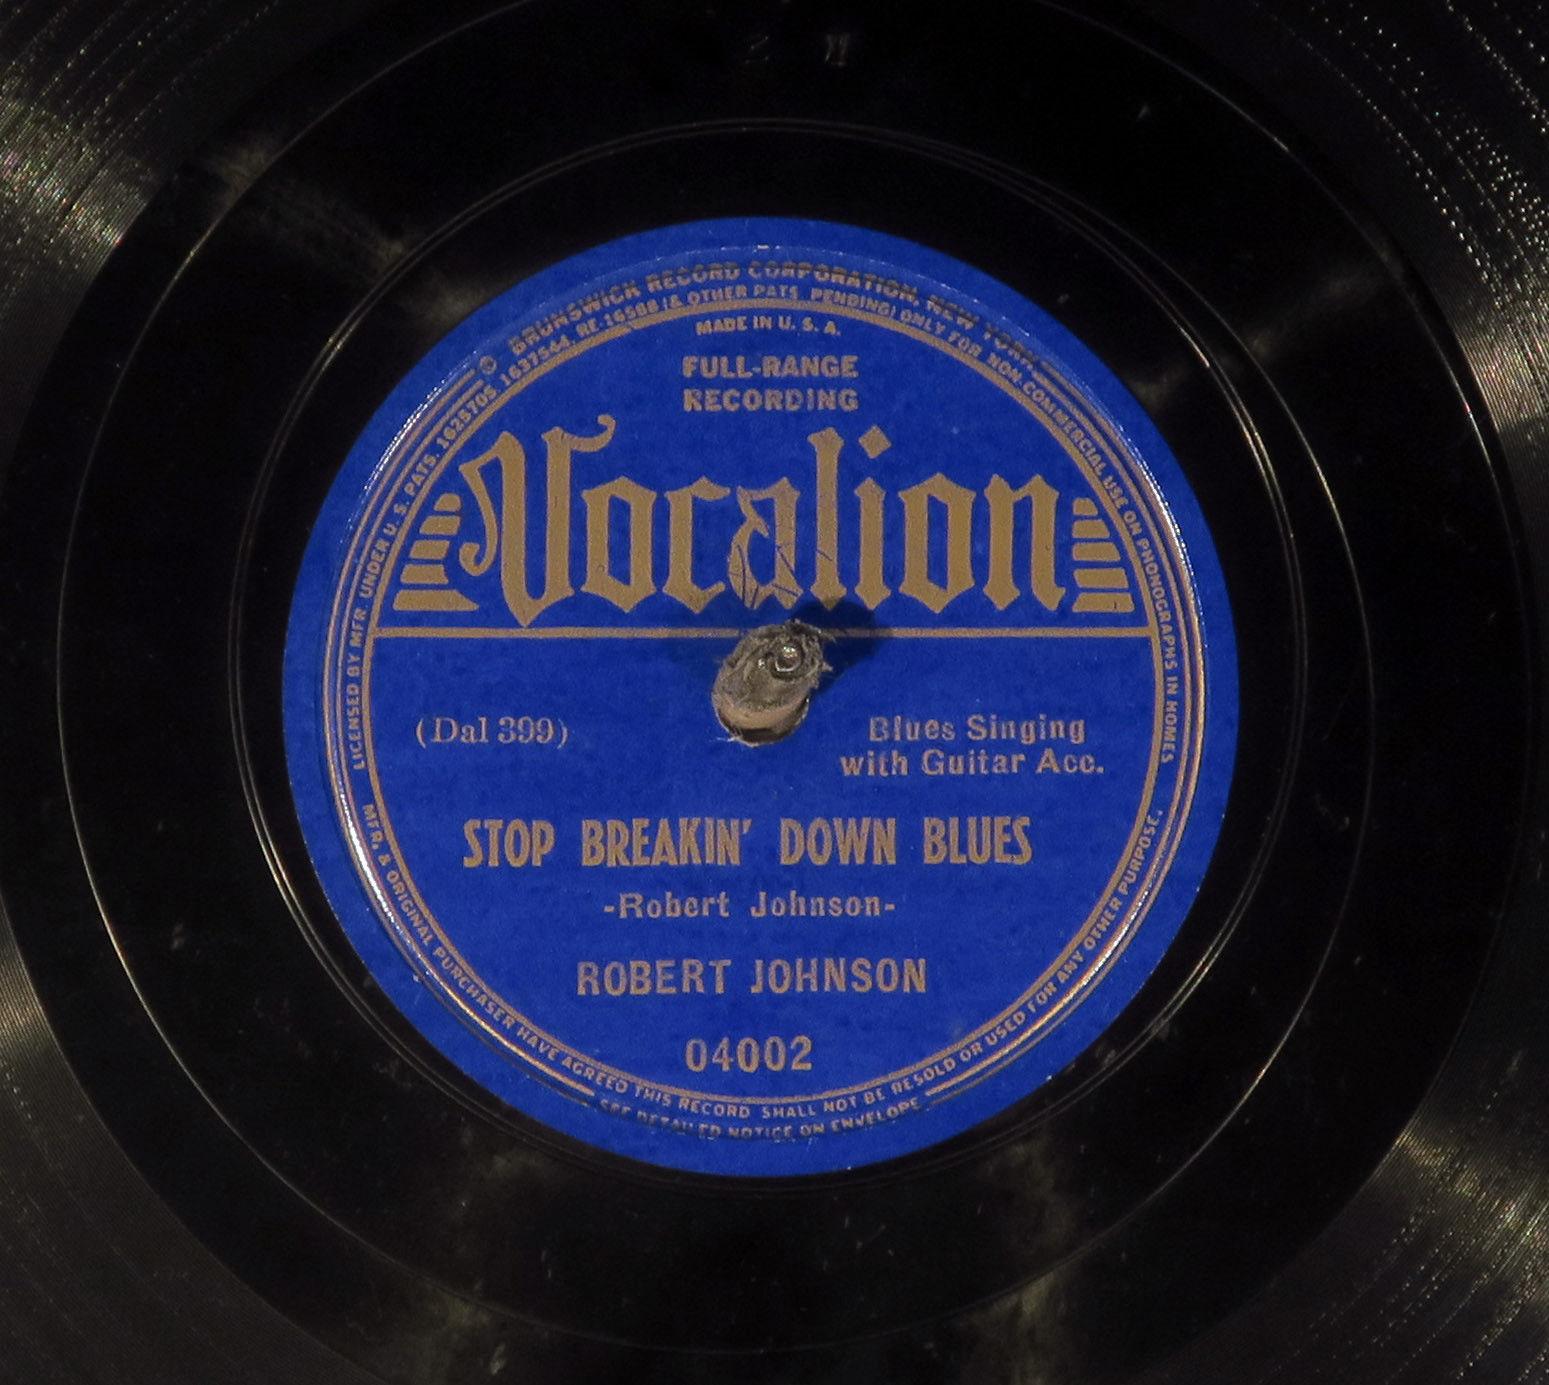 78 RPM -- Robert Johnson, Vocalion 04002, EE-  Blues